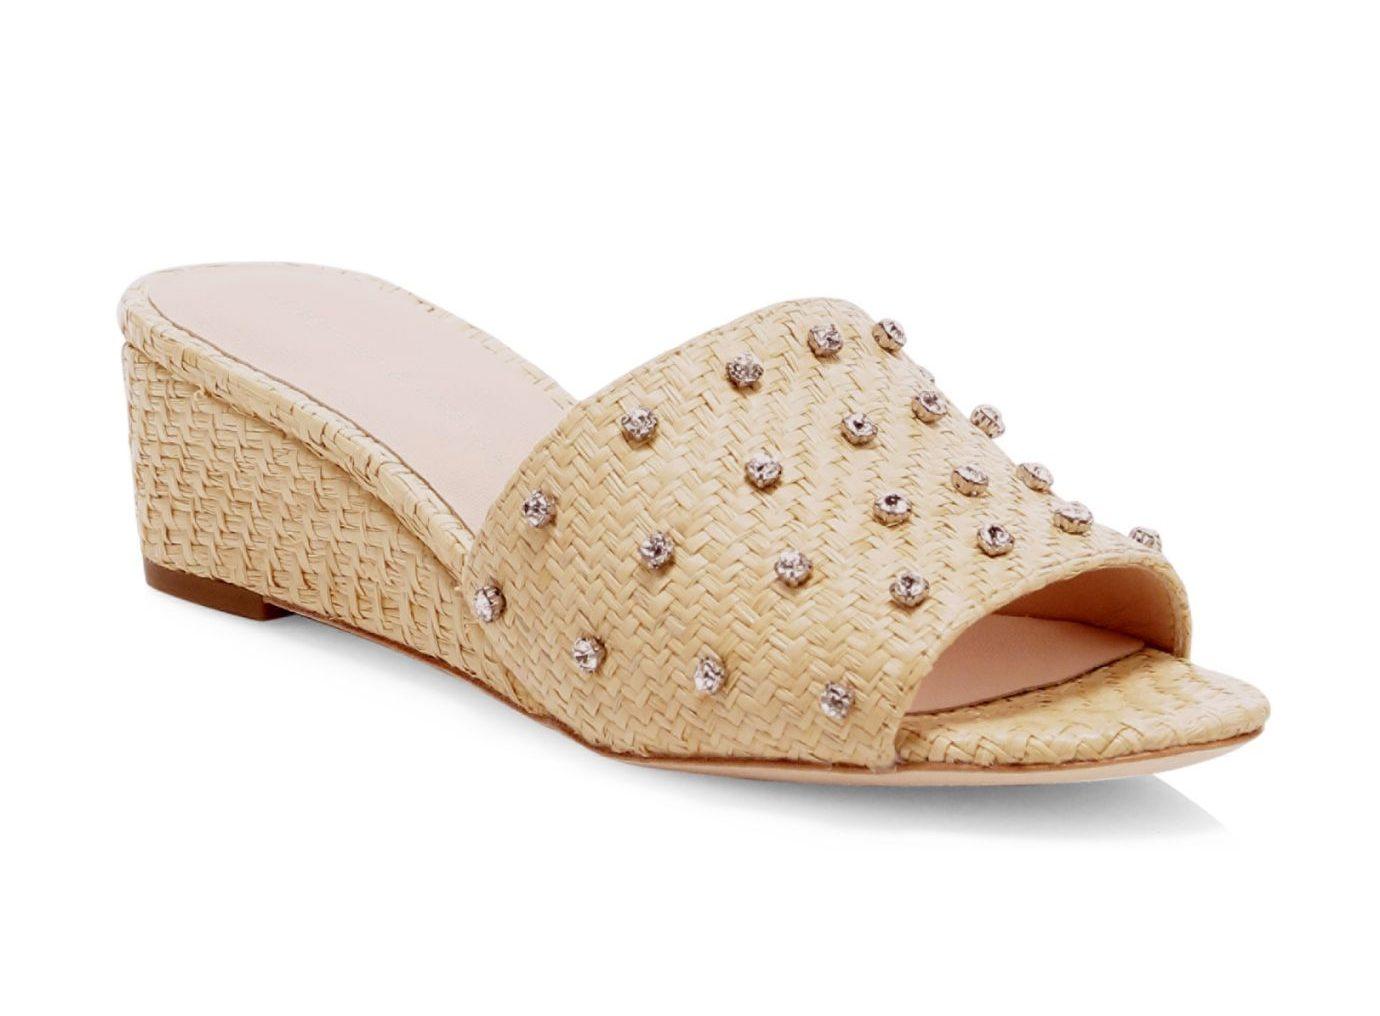 Loeffler Randall Tilly Raffia Wedge Sandals